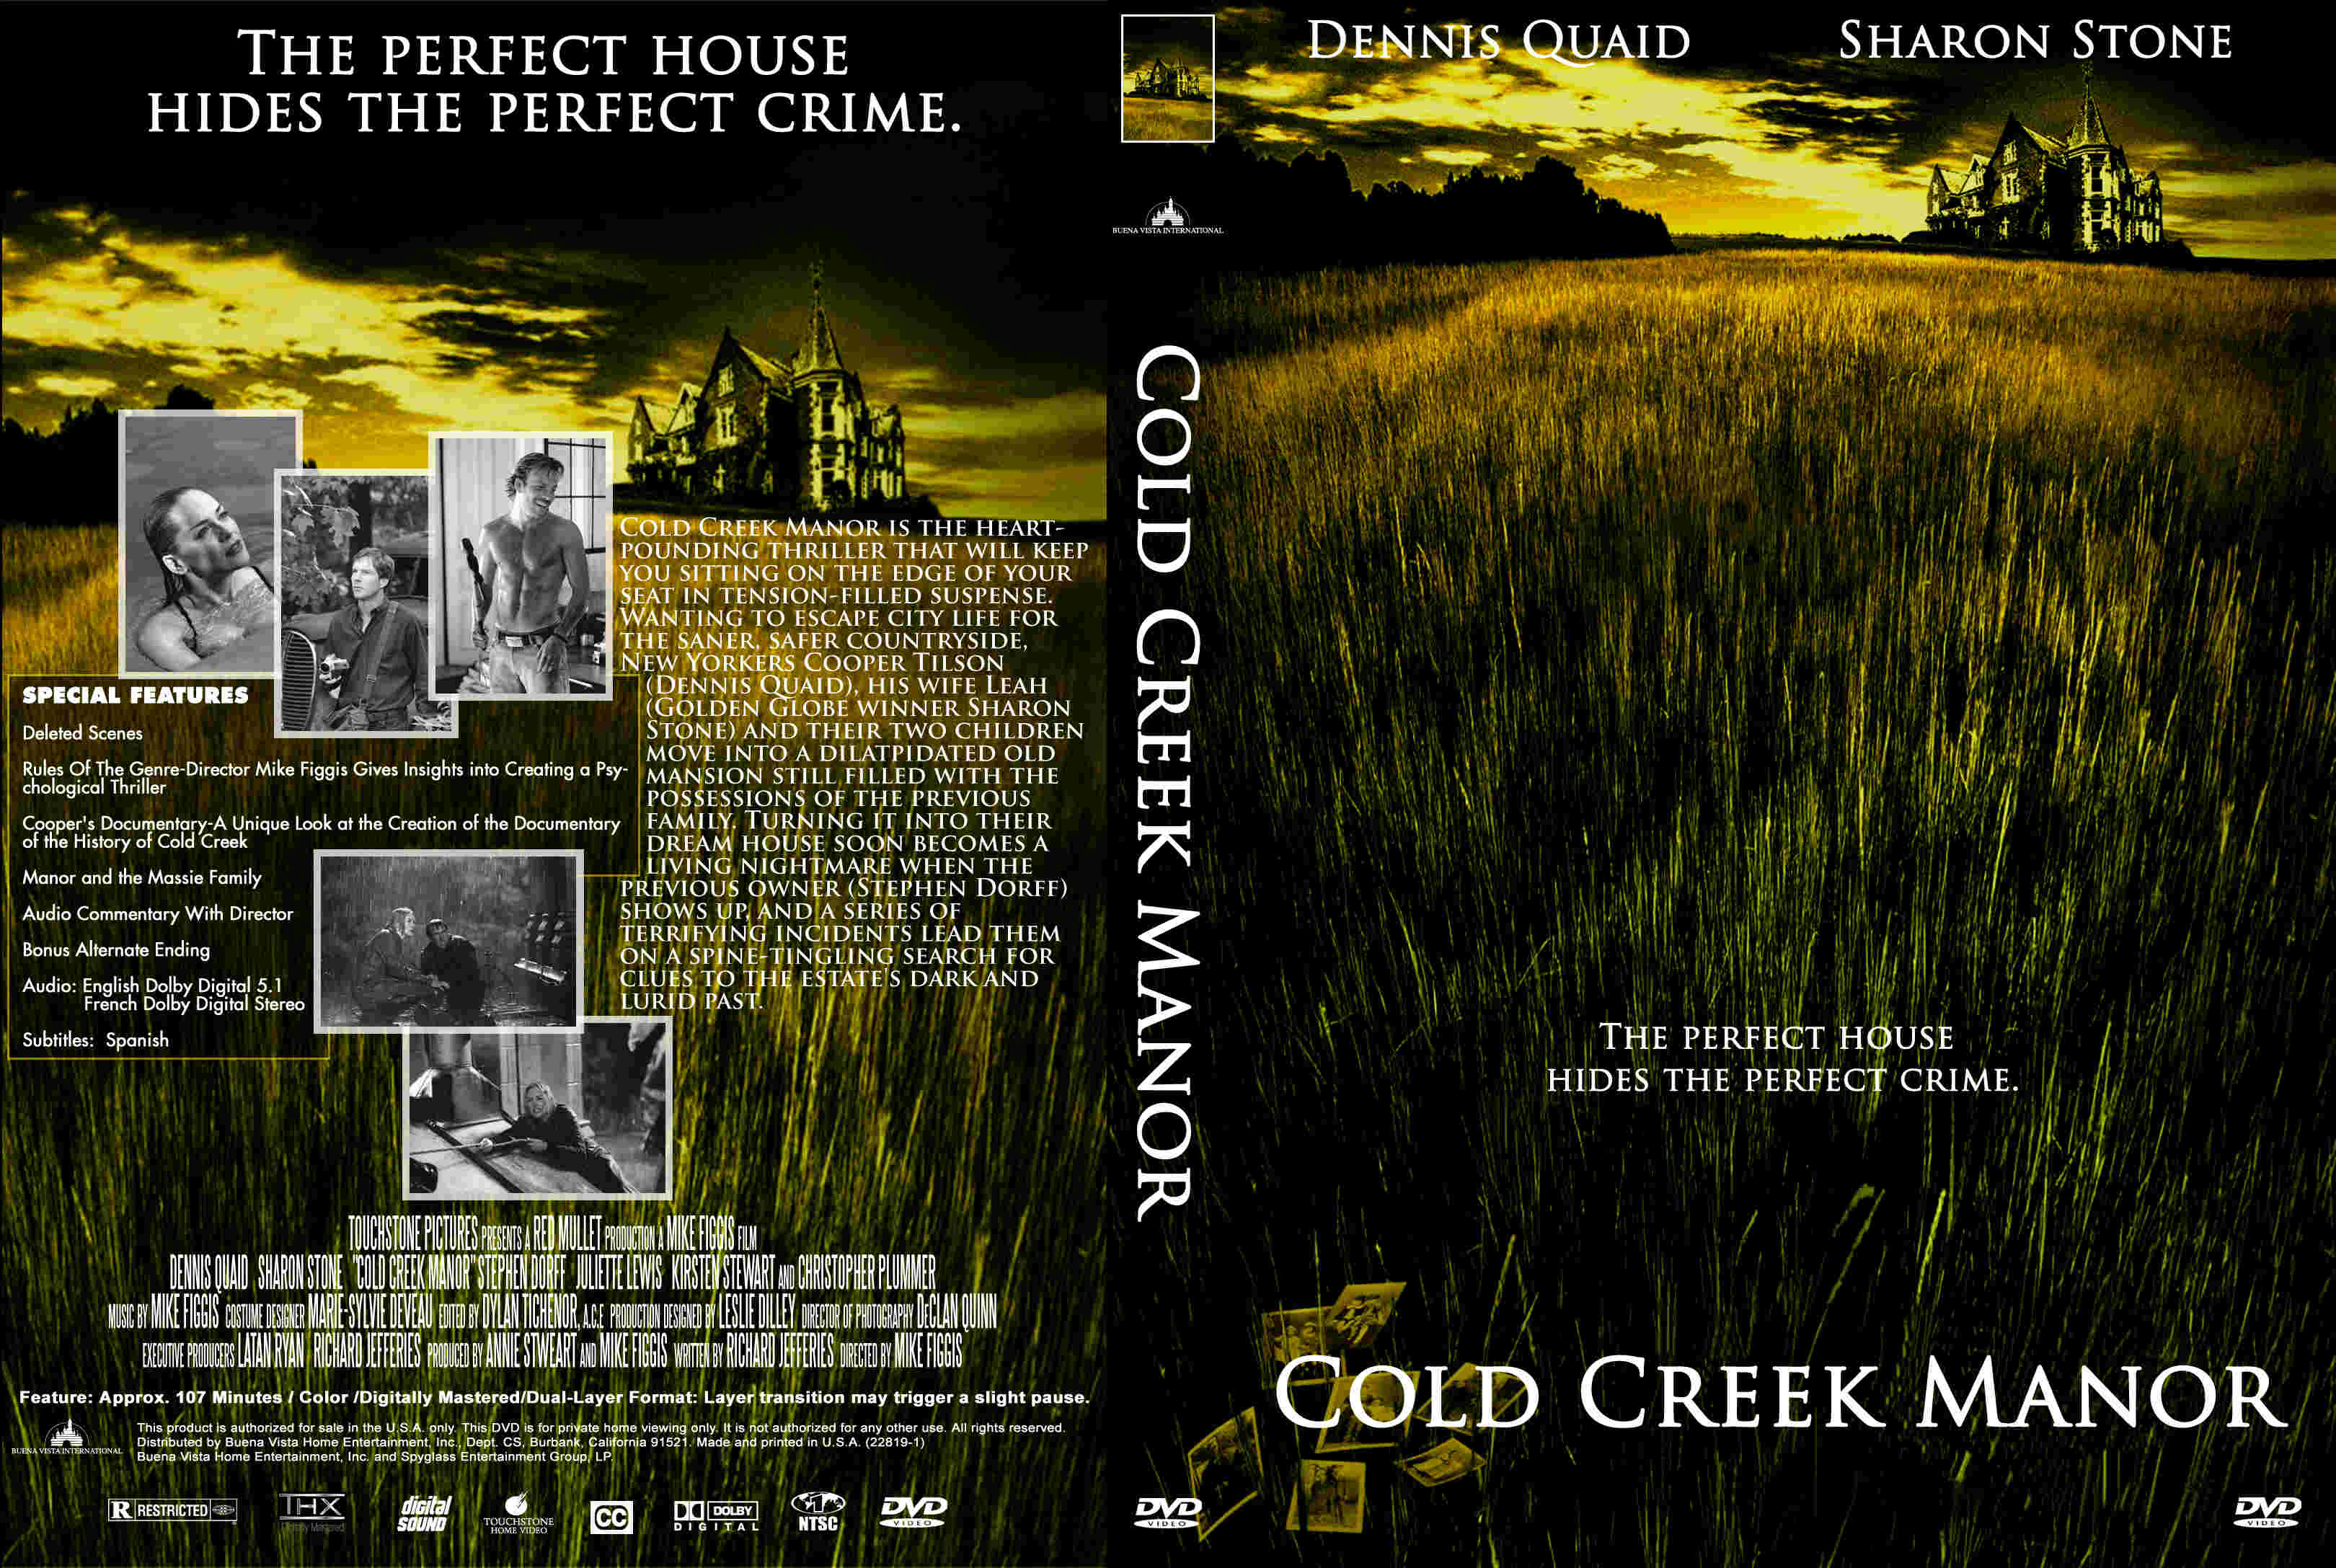 cold creek manor: